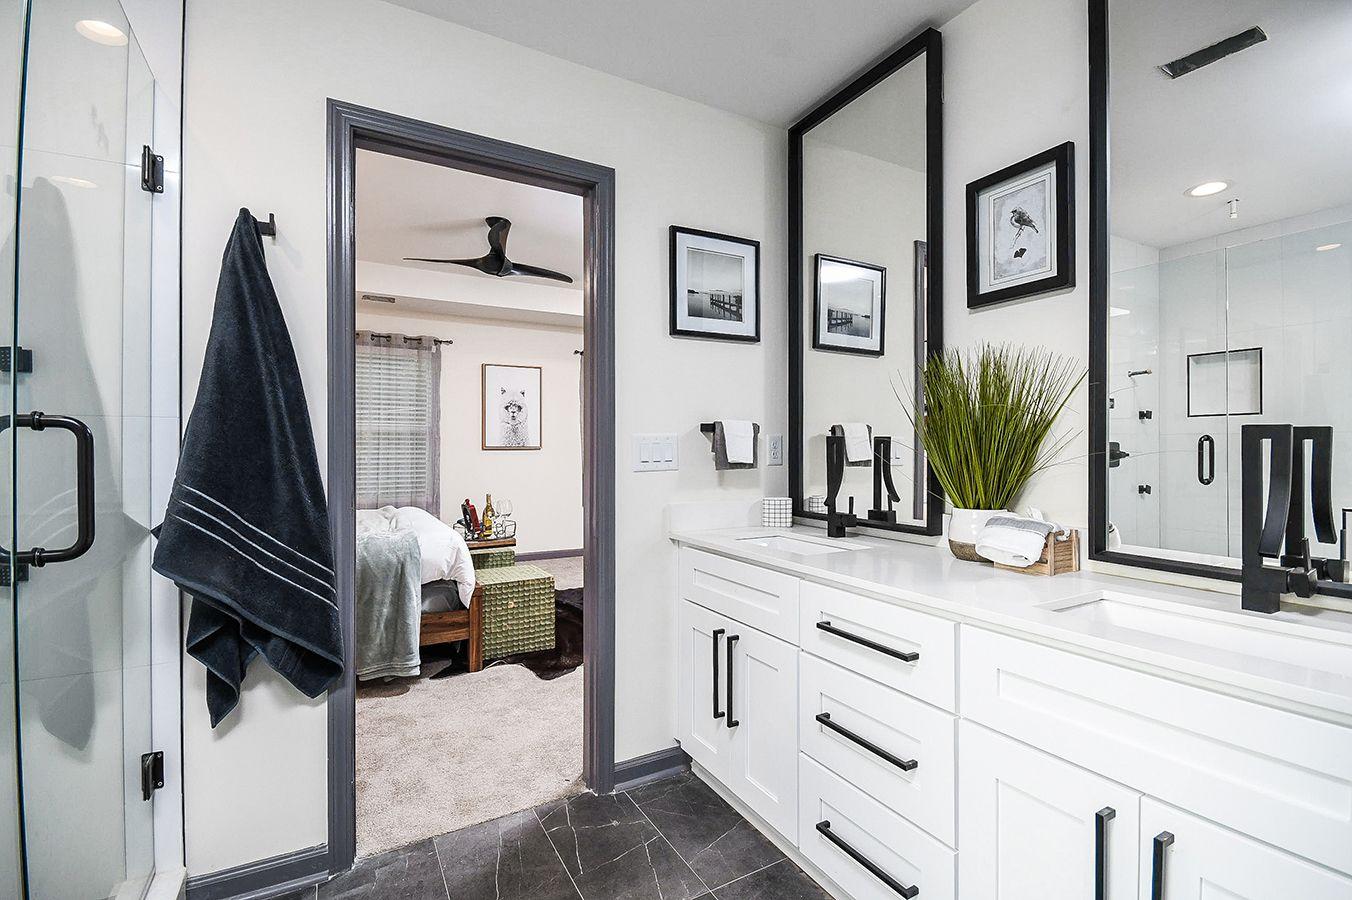 Upper_Level_Master_Bathroom_view8.jpg